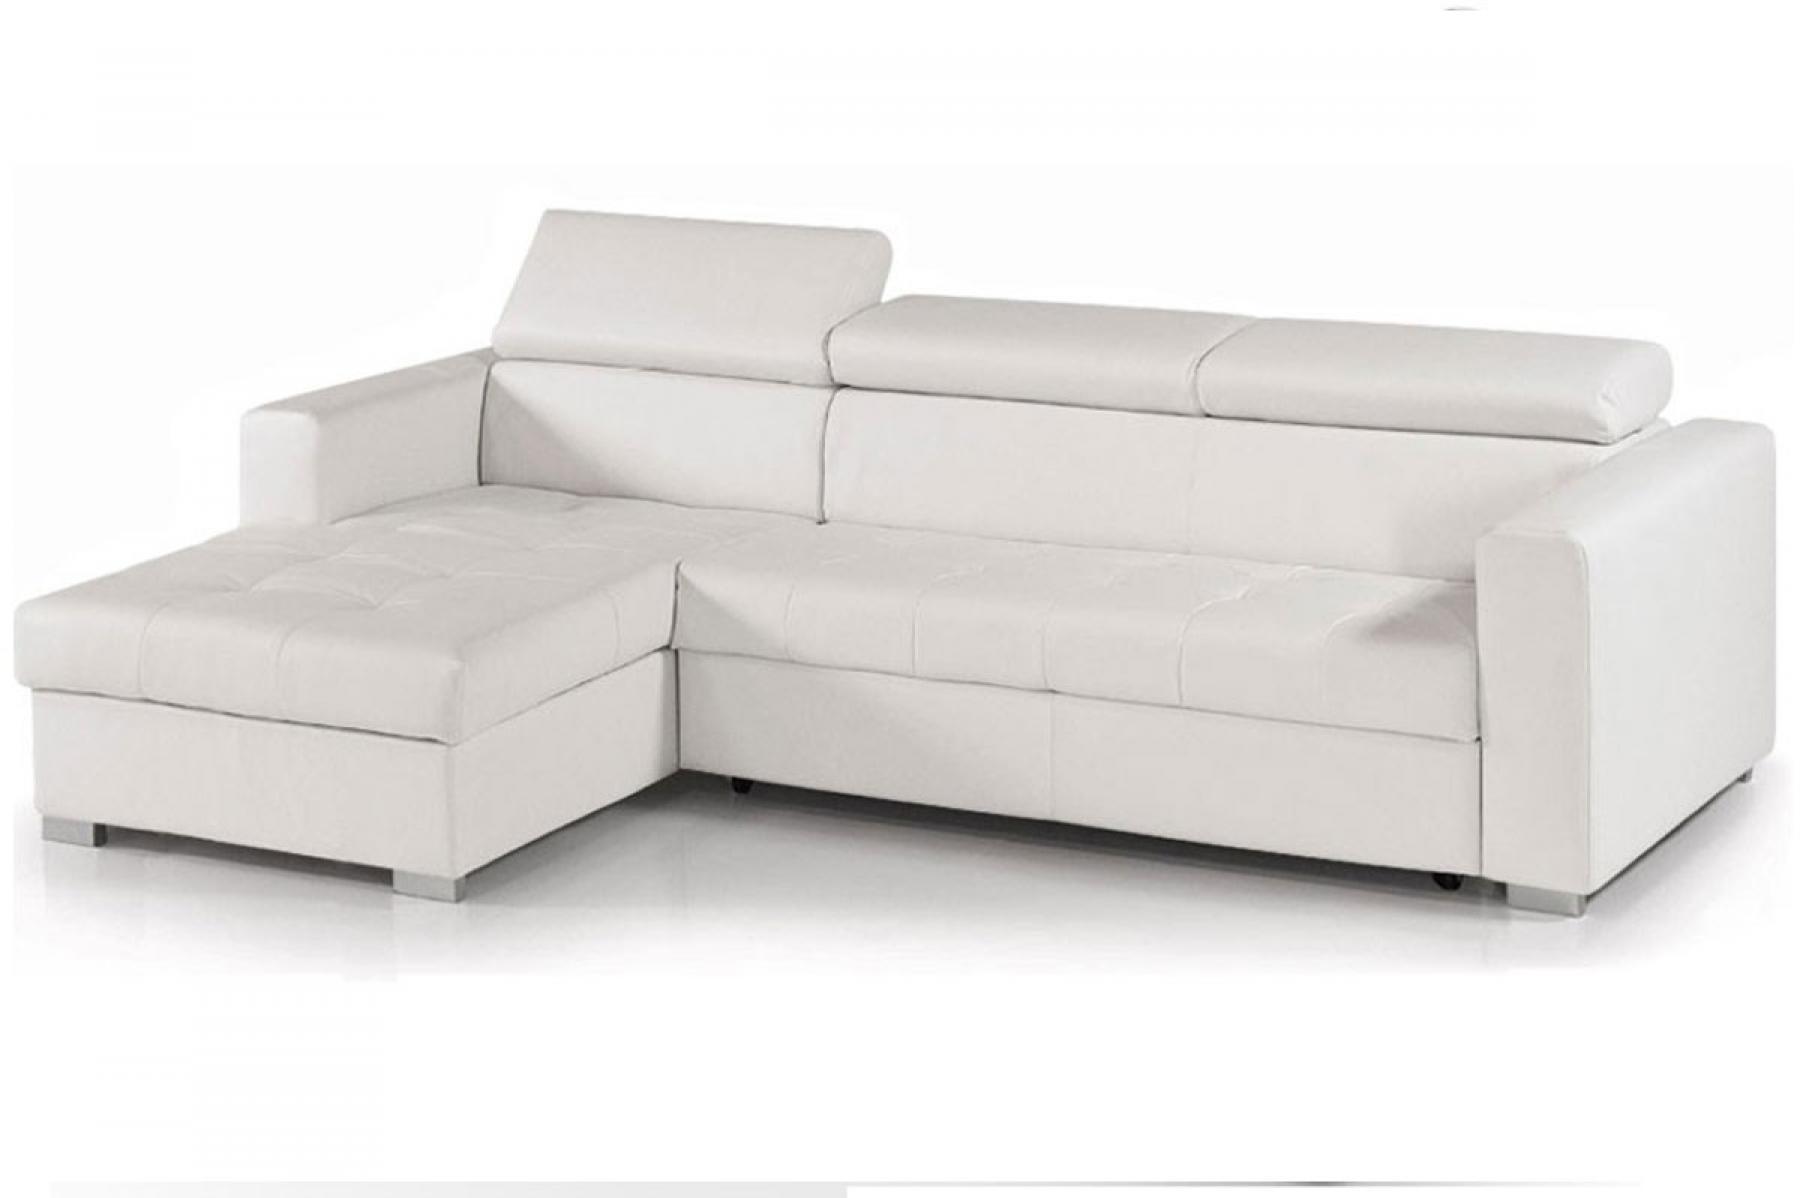 Canapé Arrondi Ikea Luxe Photos Canap Petit Angle Teinture Pour Canap En Cuir Lovely Waitro Page